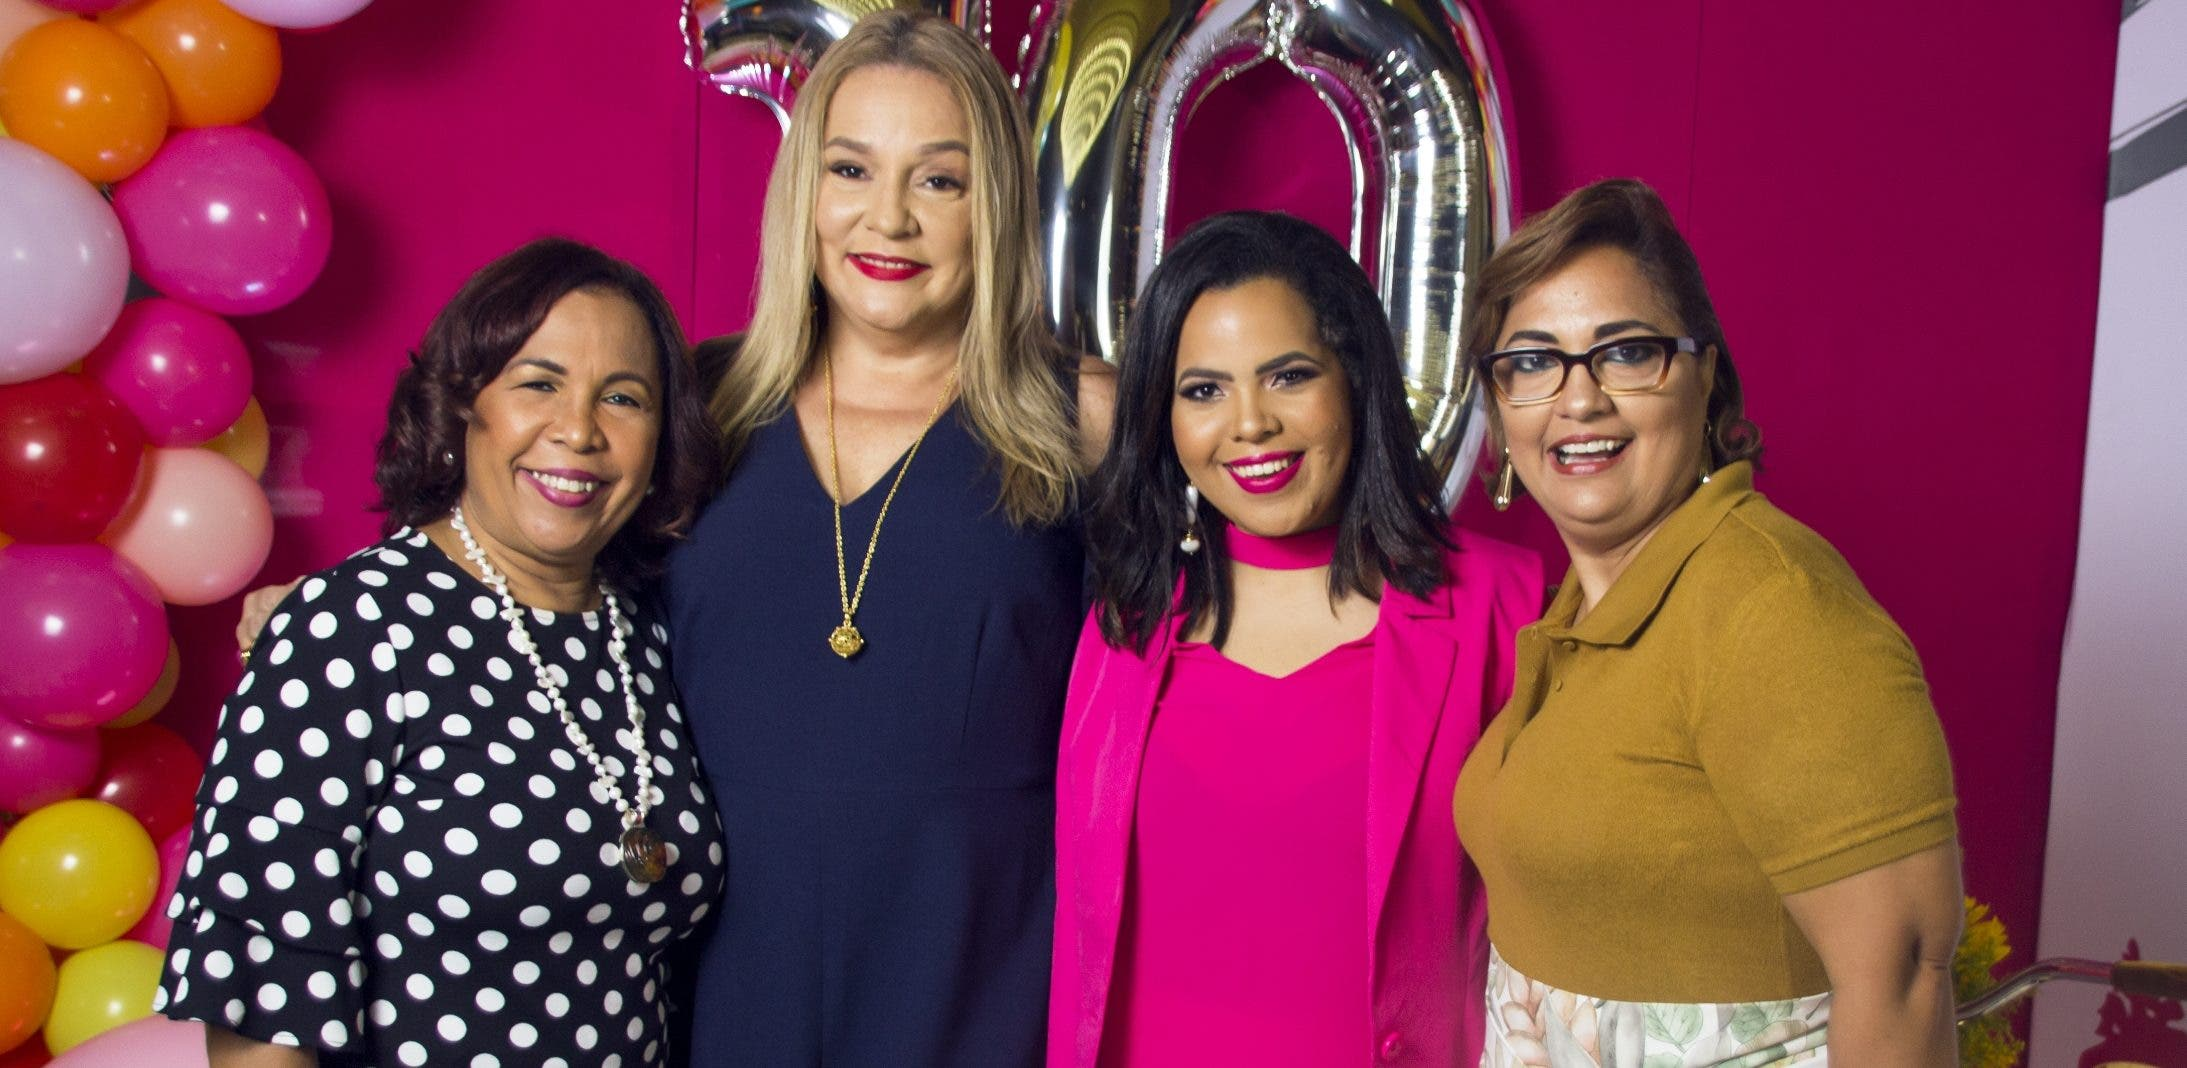 Zoila Puello, Jatnna Tavárez, Marielle Araujo y Anny Abate.